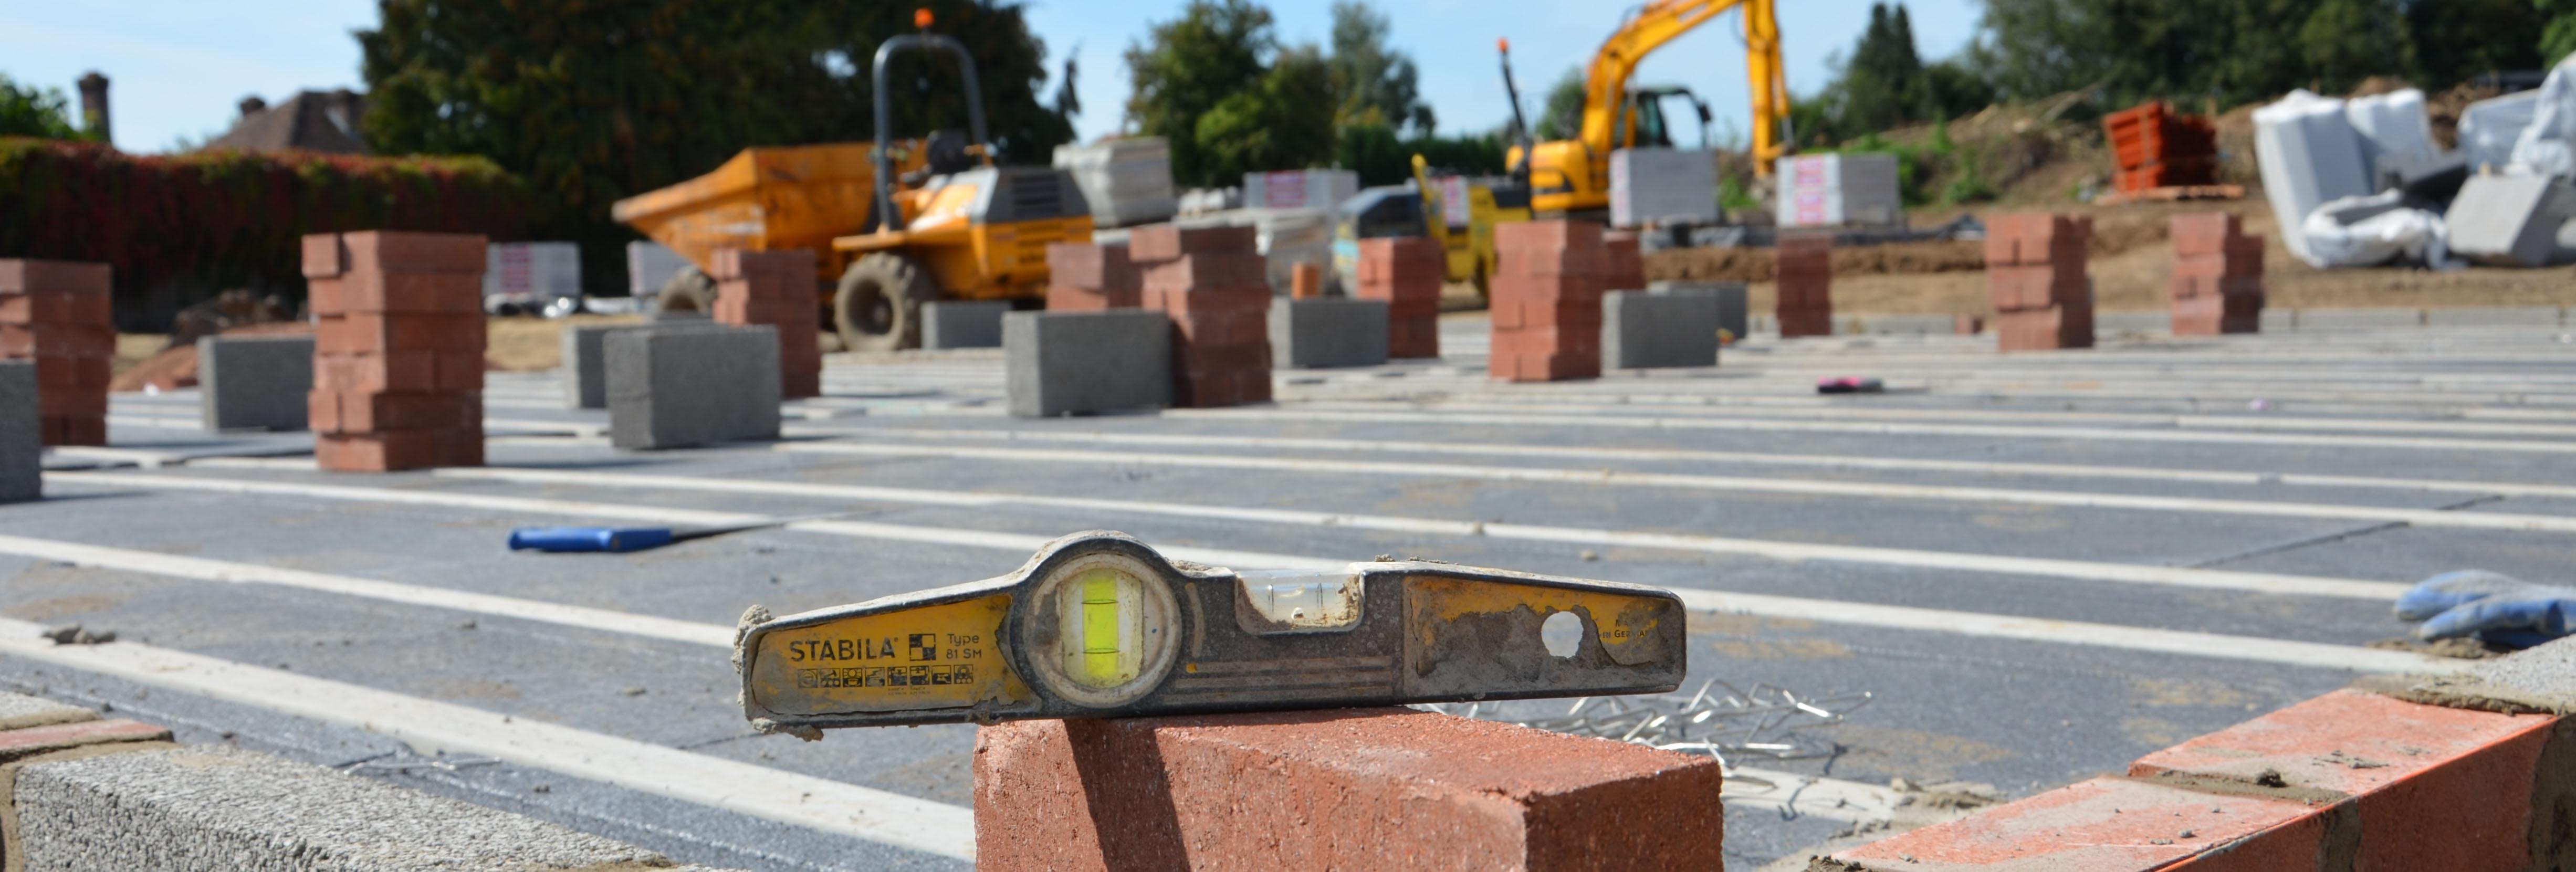 Building site - trowel